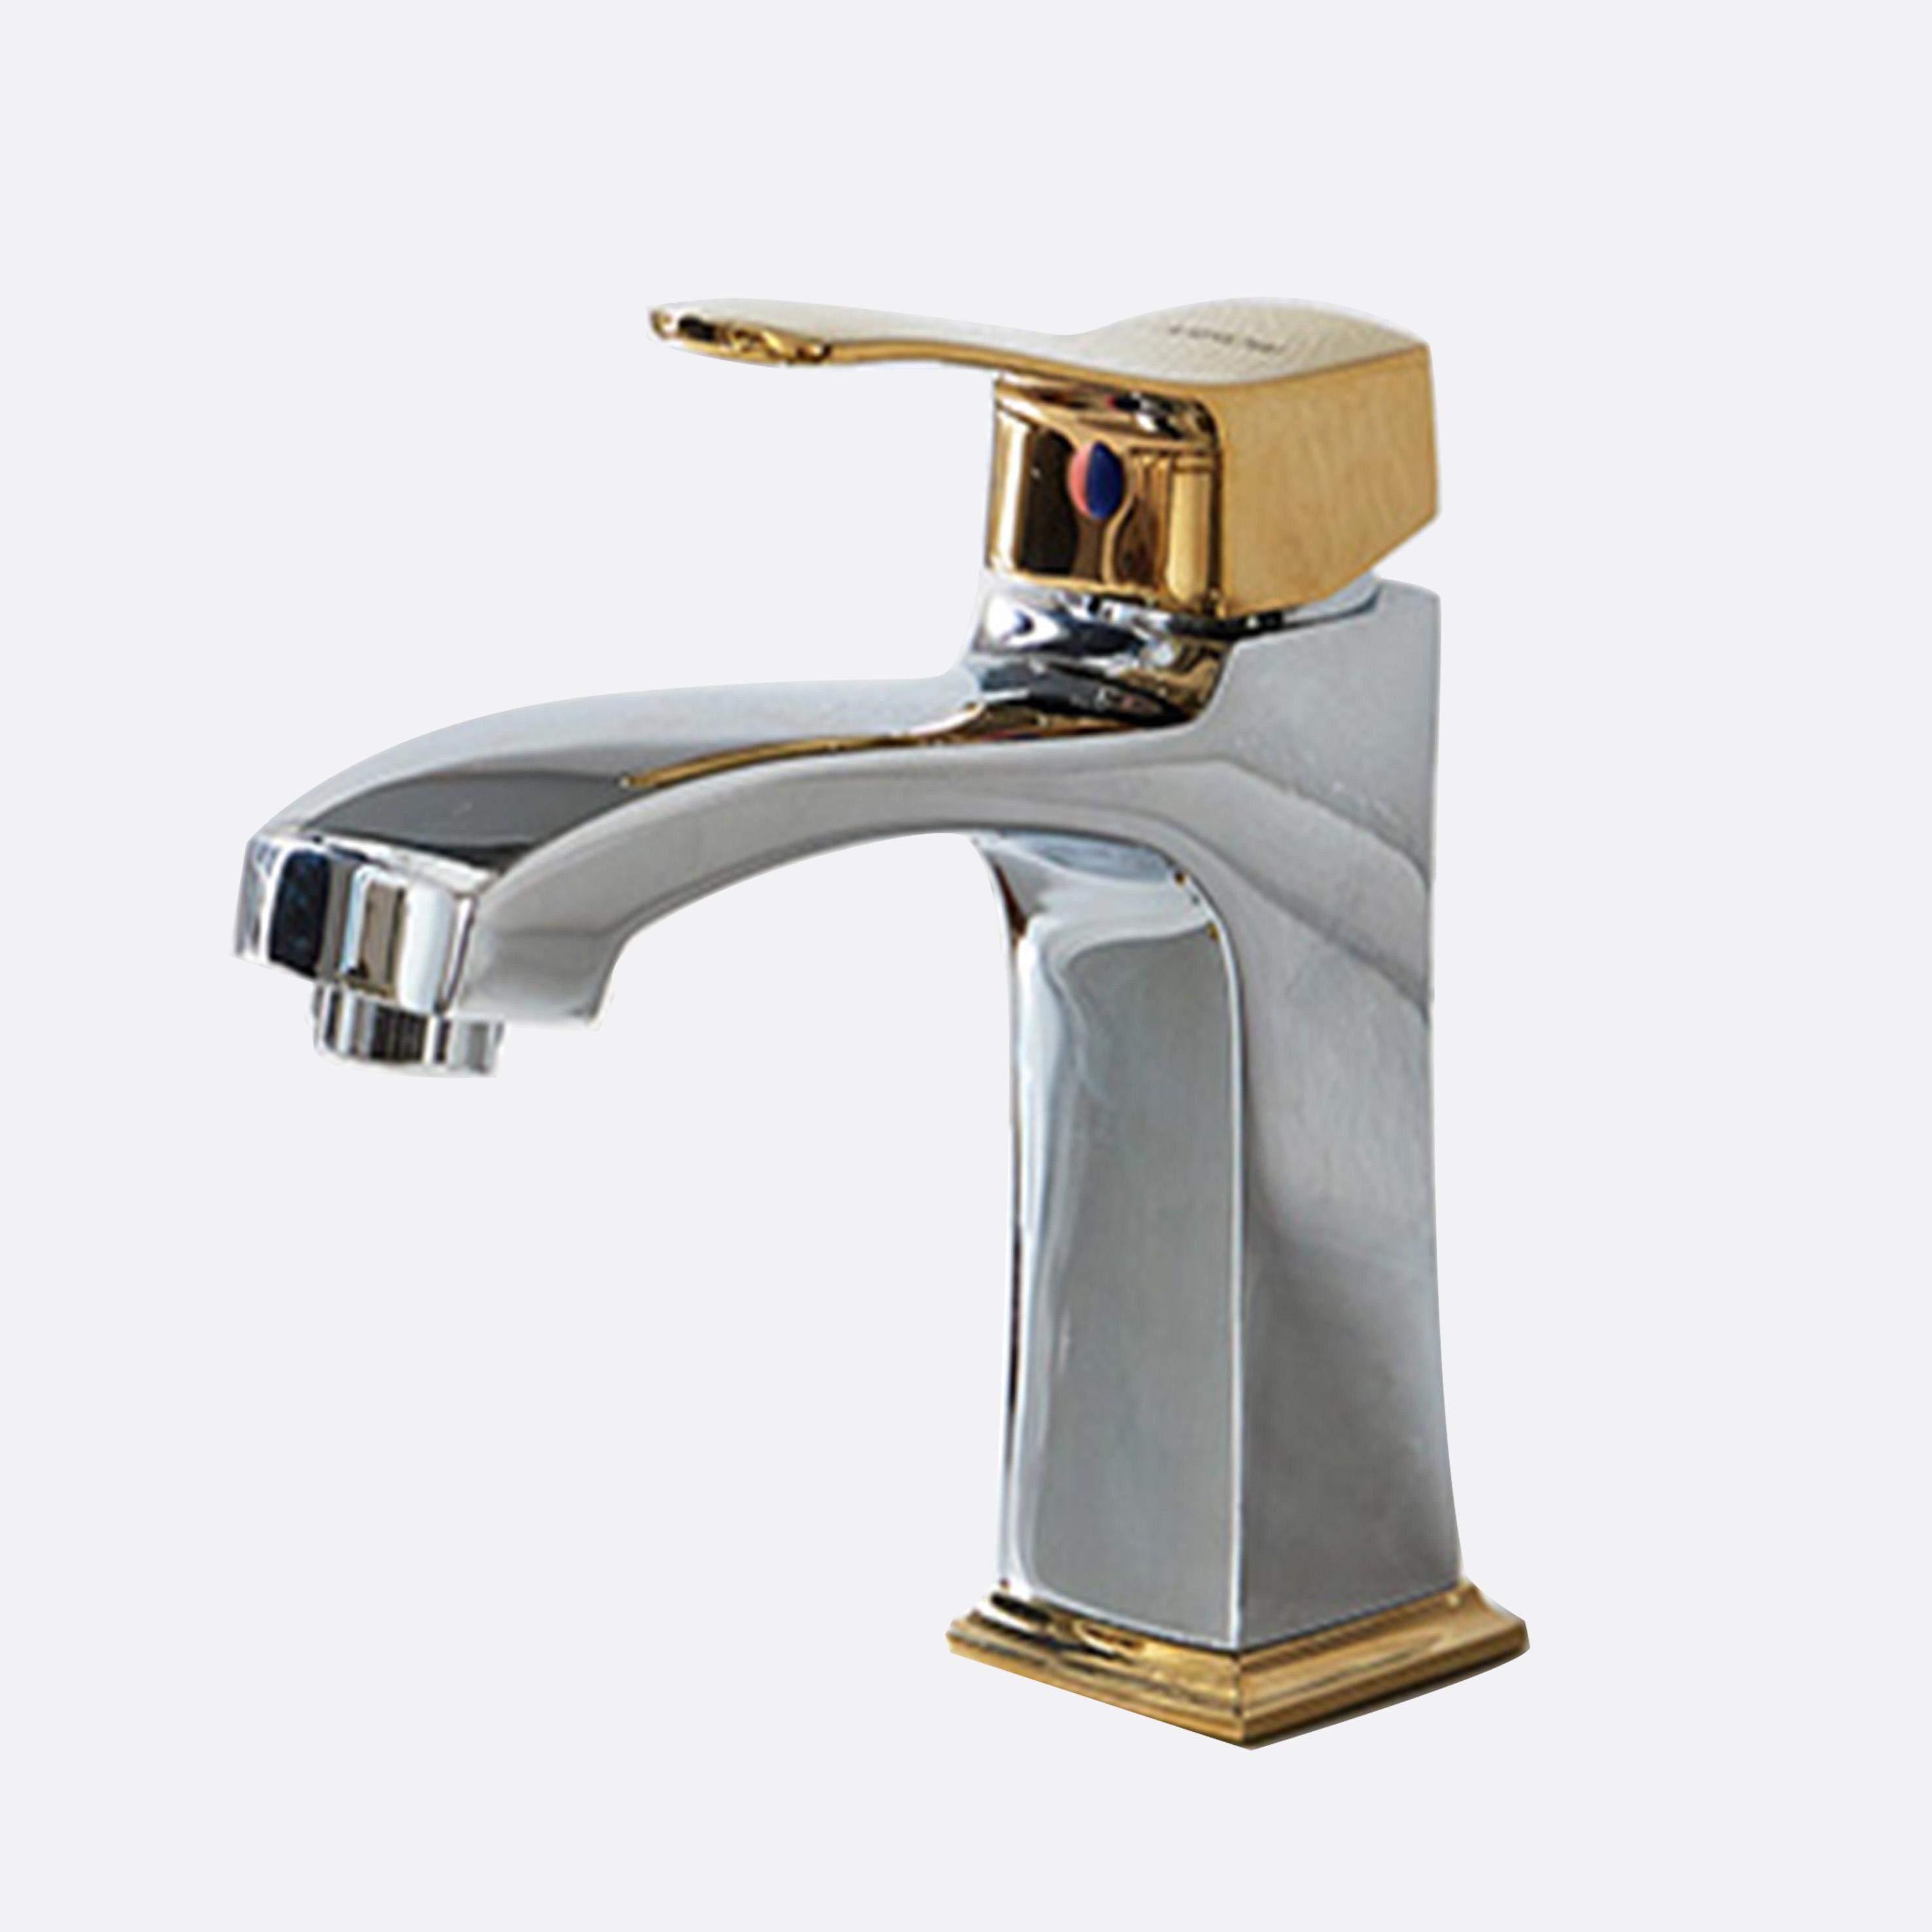 ARROW Gold Brushed High Standard Bathroom Faucet